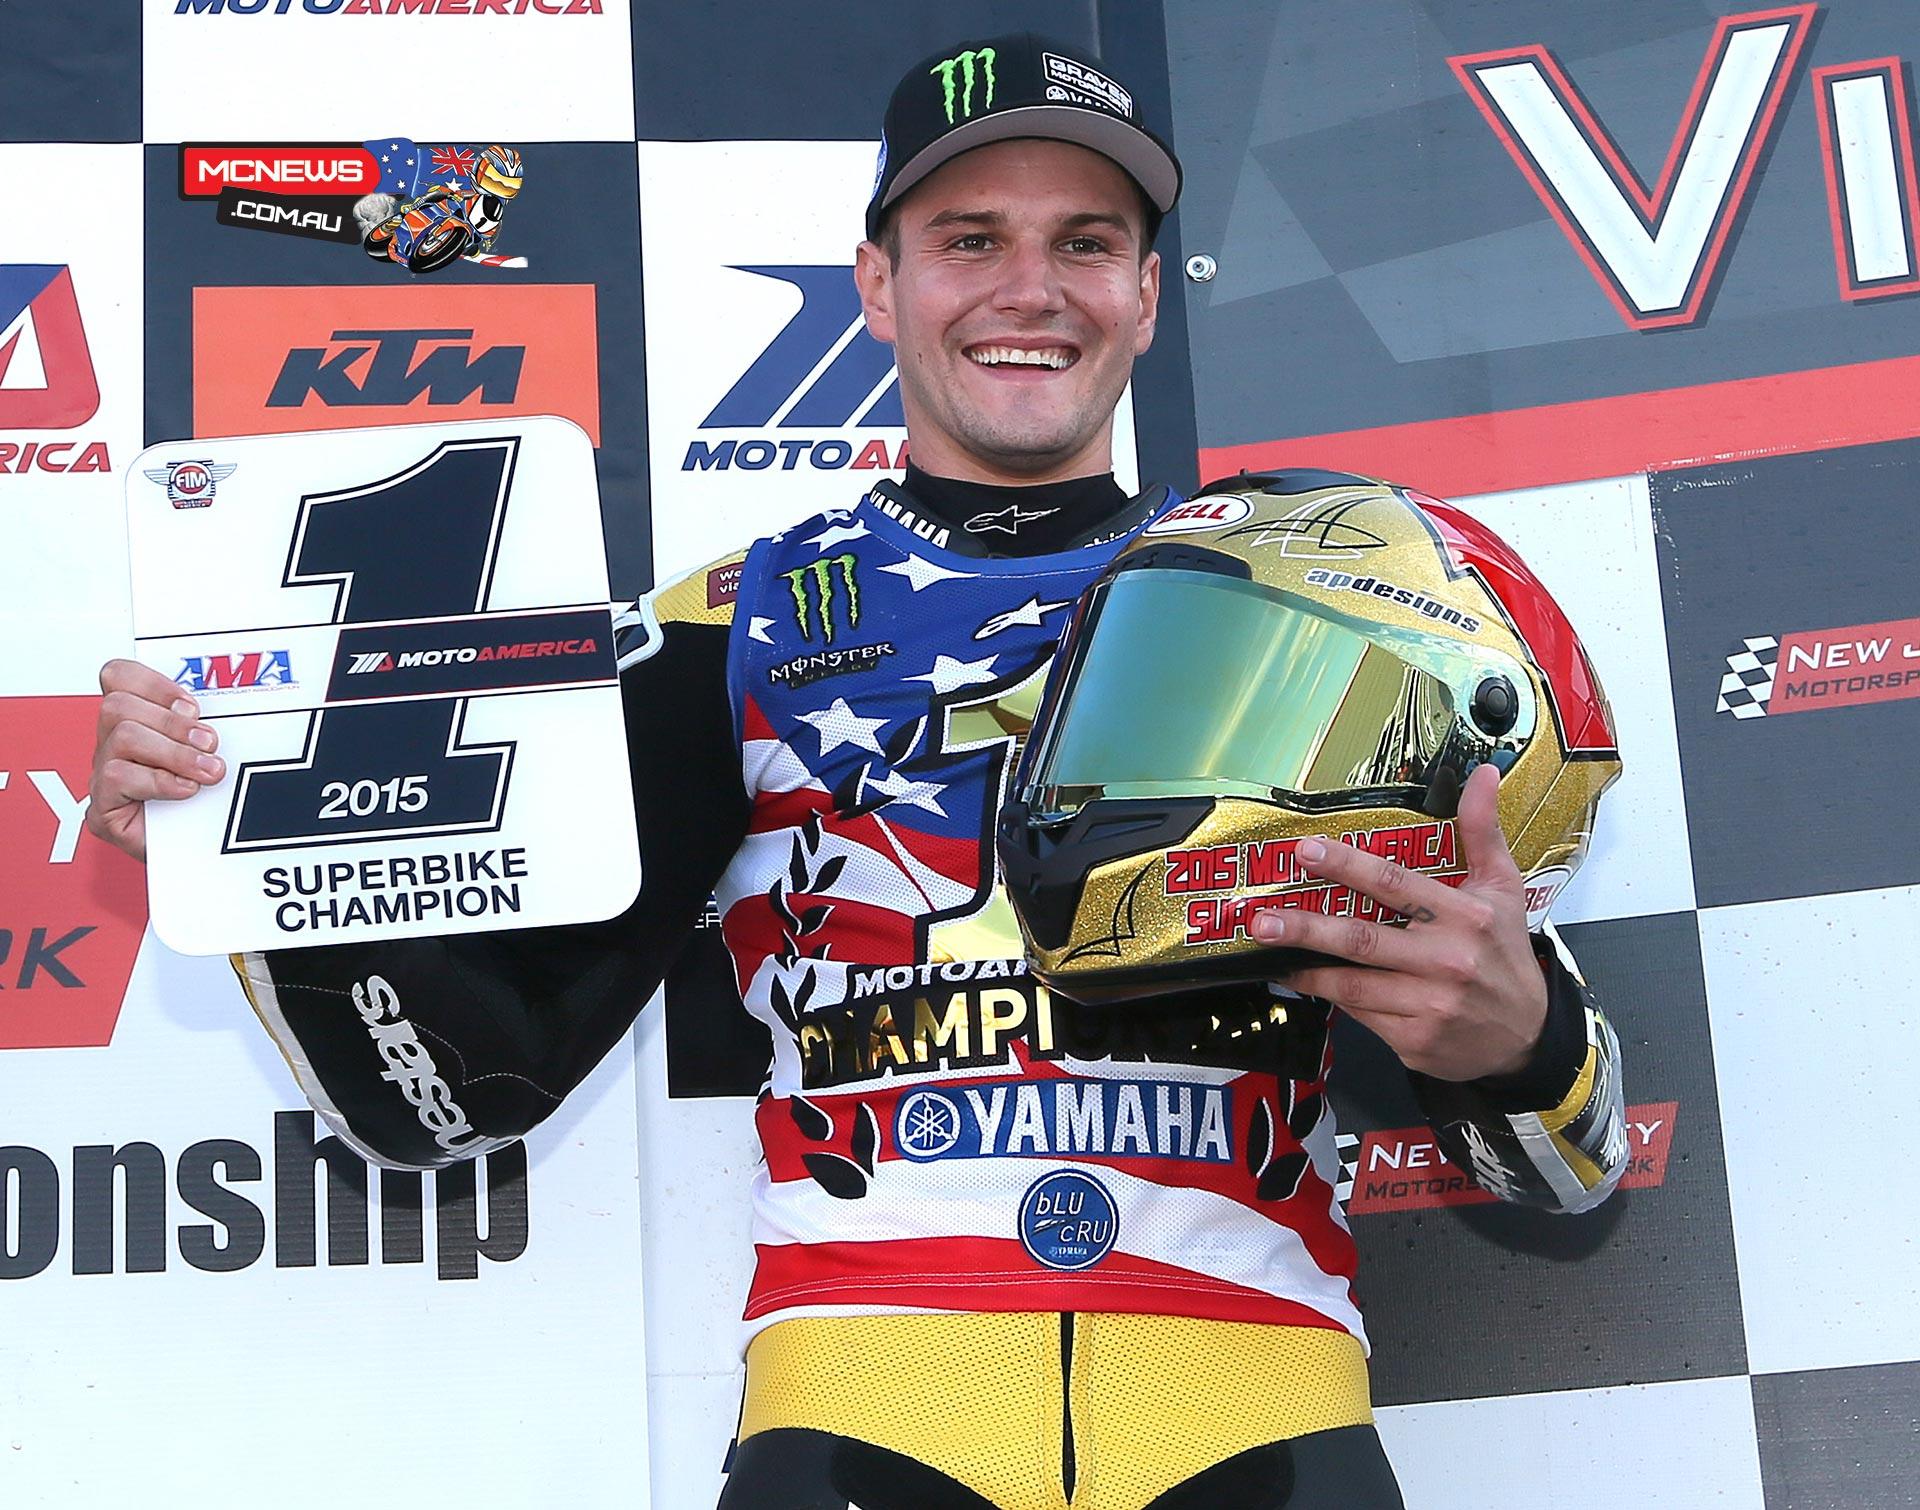 Cameron Beaubier won the 2015 MotoAmerica Superbike Championship on Sunday at New Jersey Motorsports Park. Photography by Brian J. Nelson.